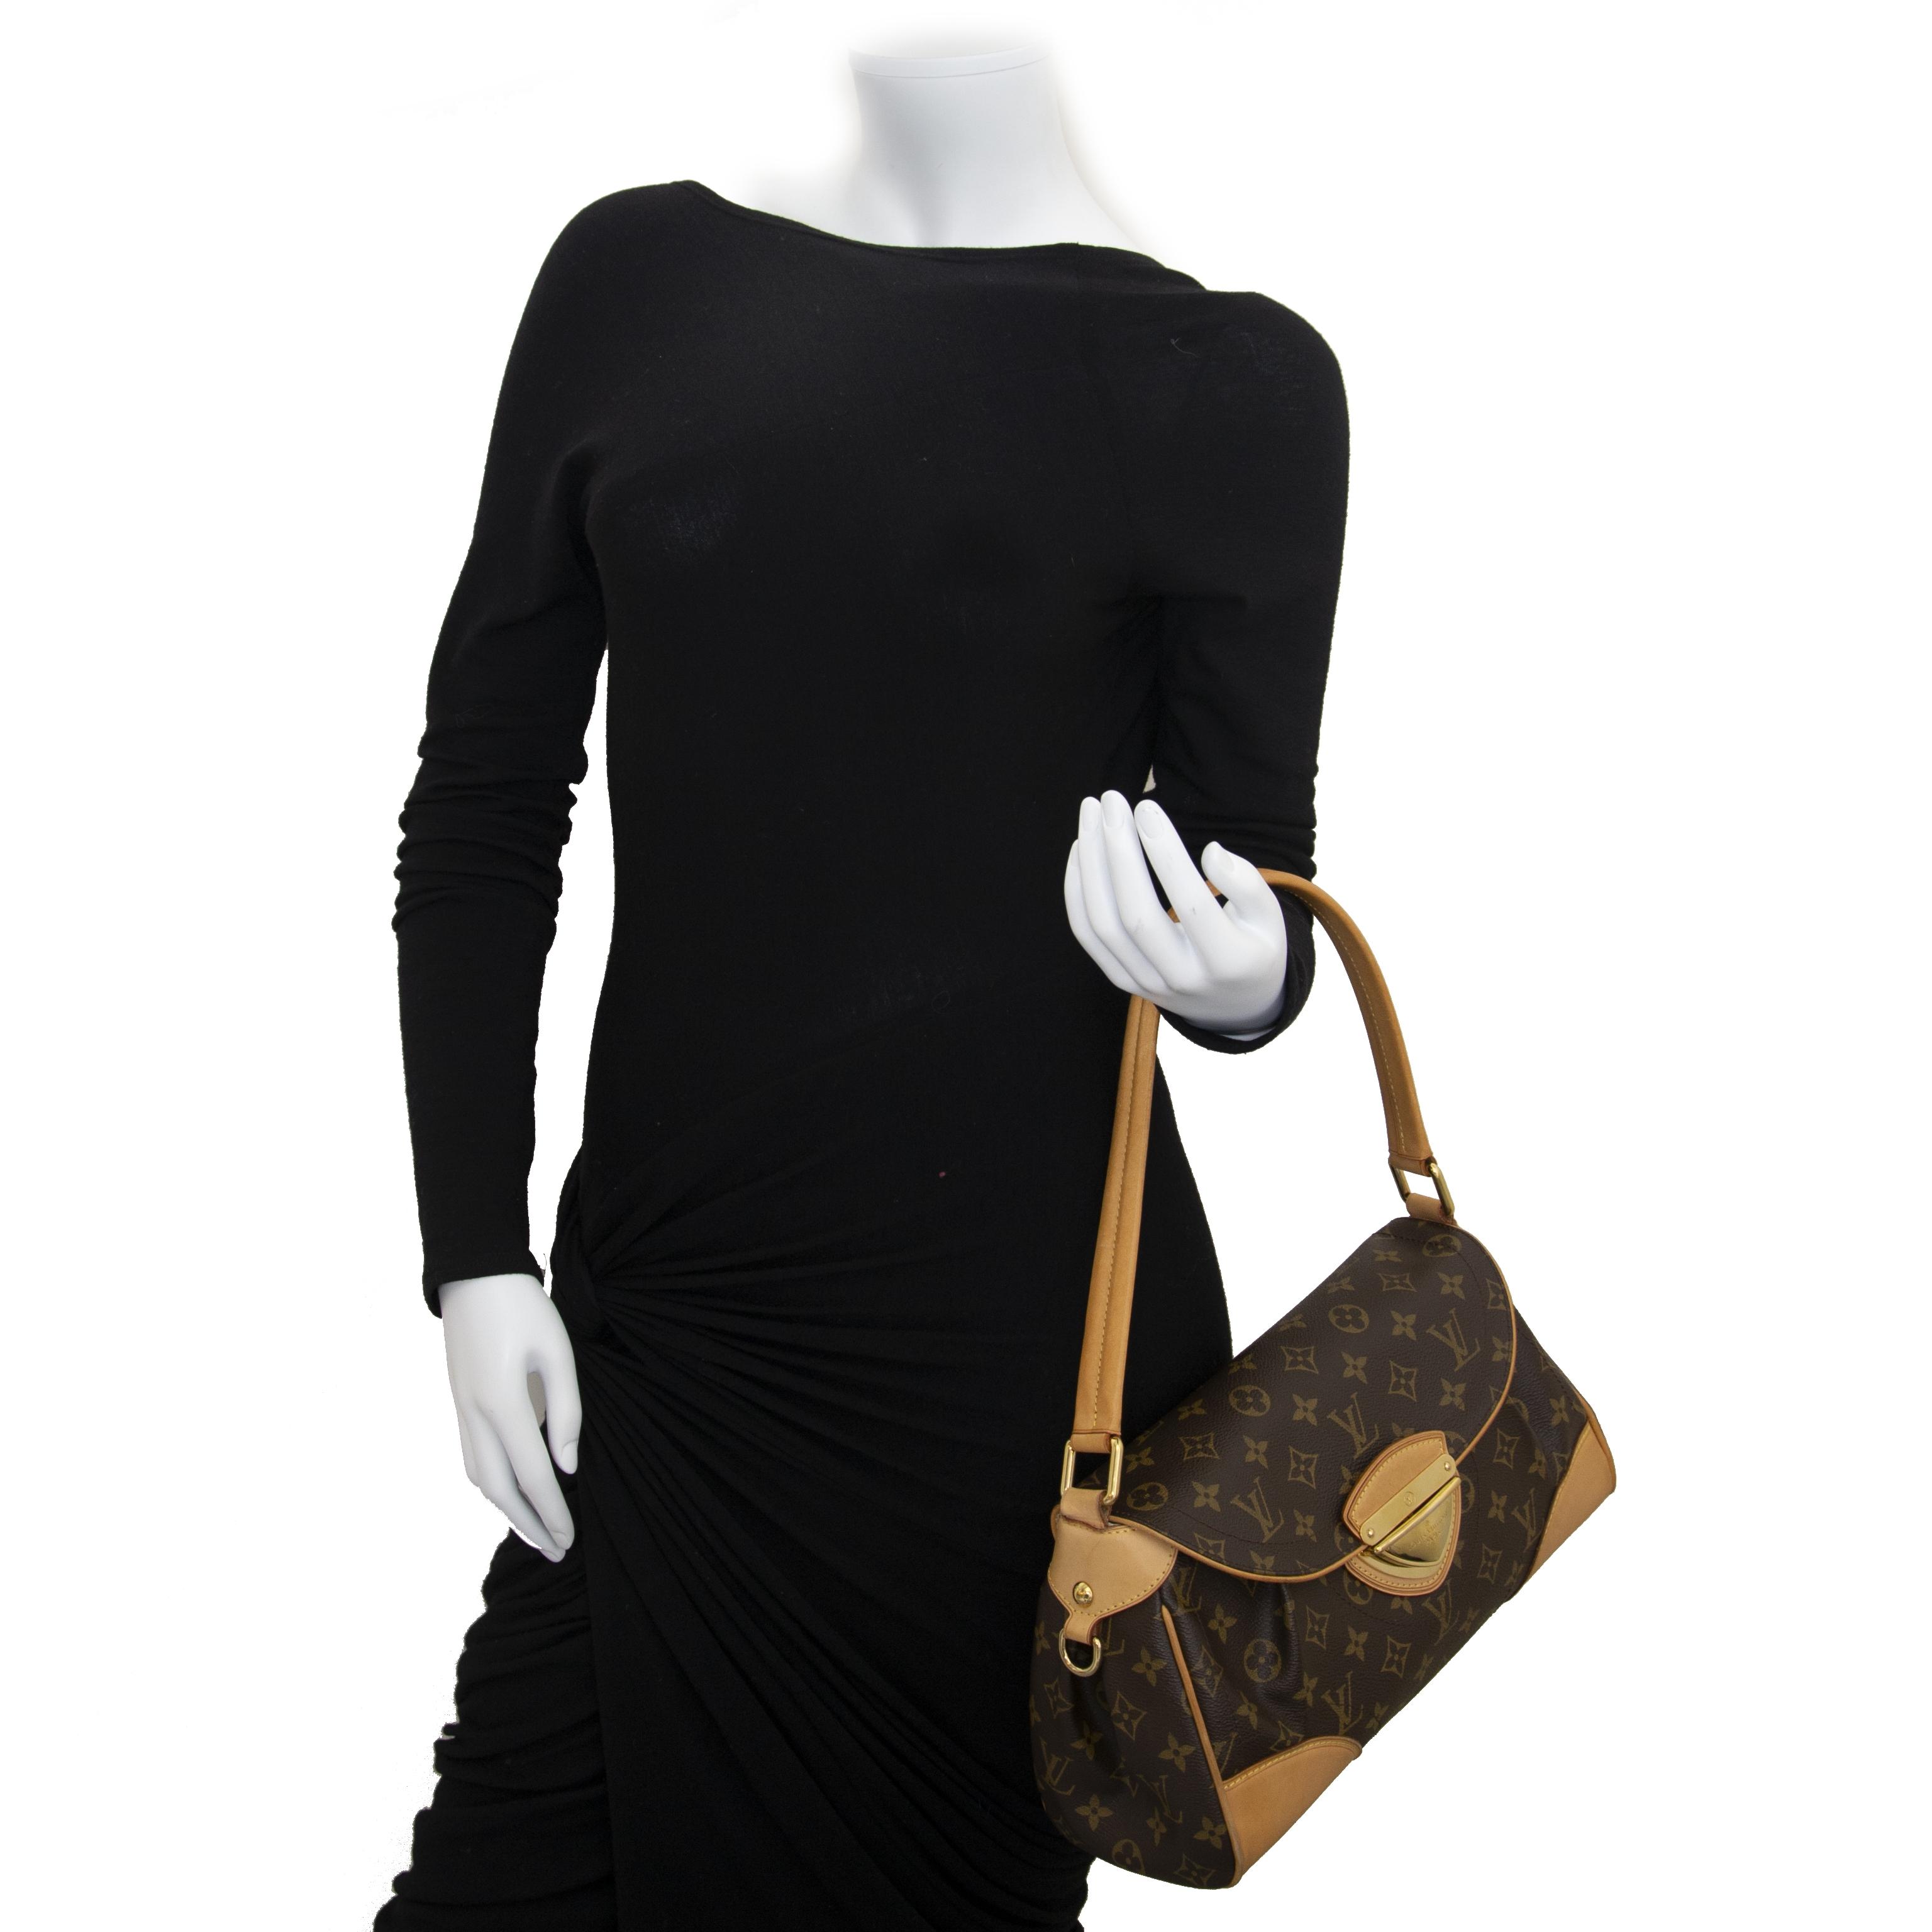 Louis Vuitton Monogram Beverly MM Bag now for sale at labellov vintage fashion webshop belgium